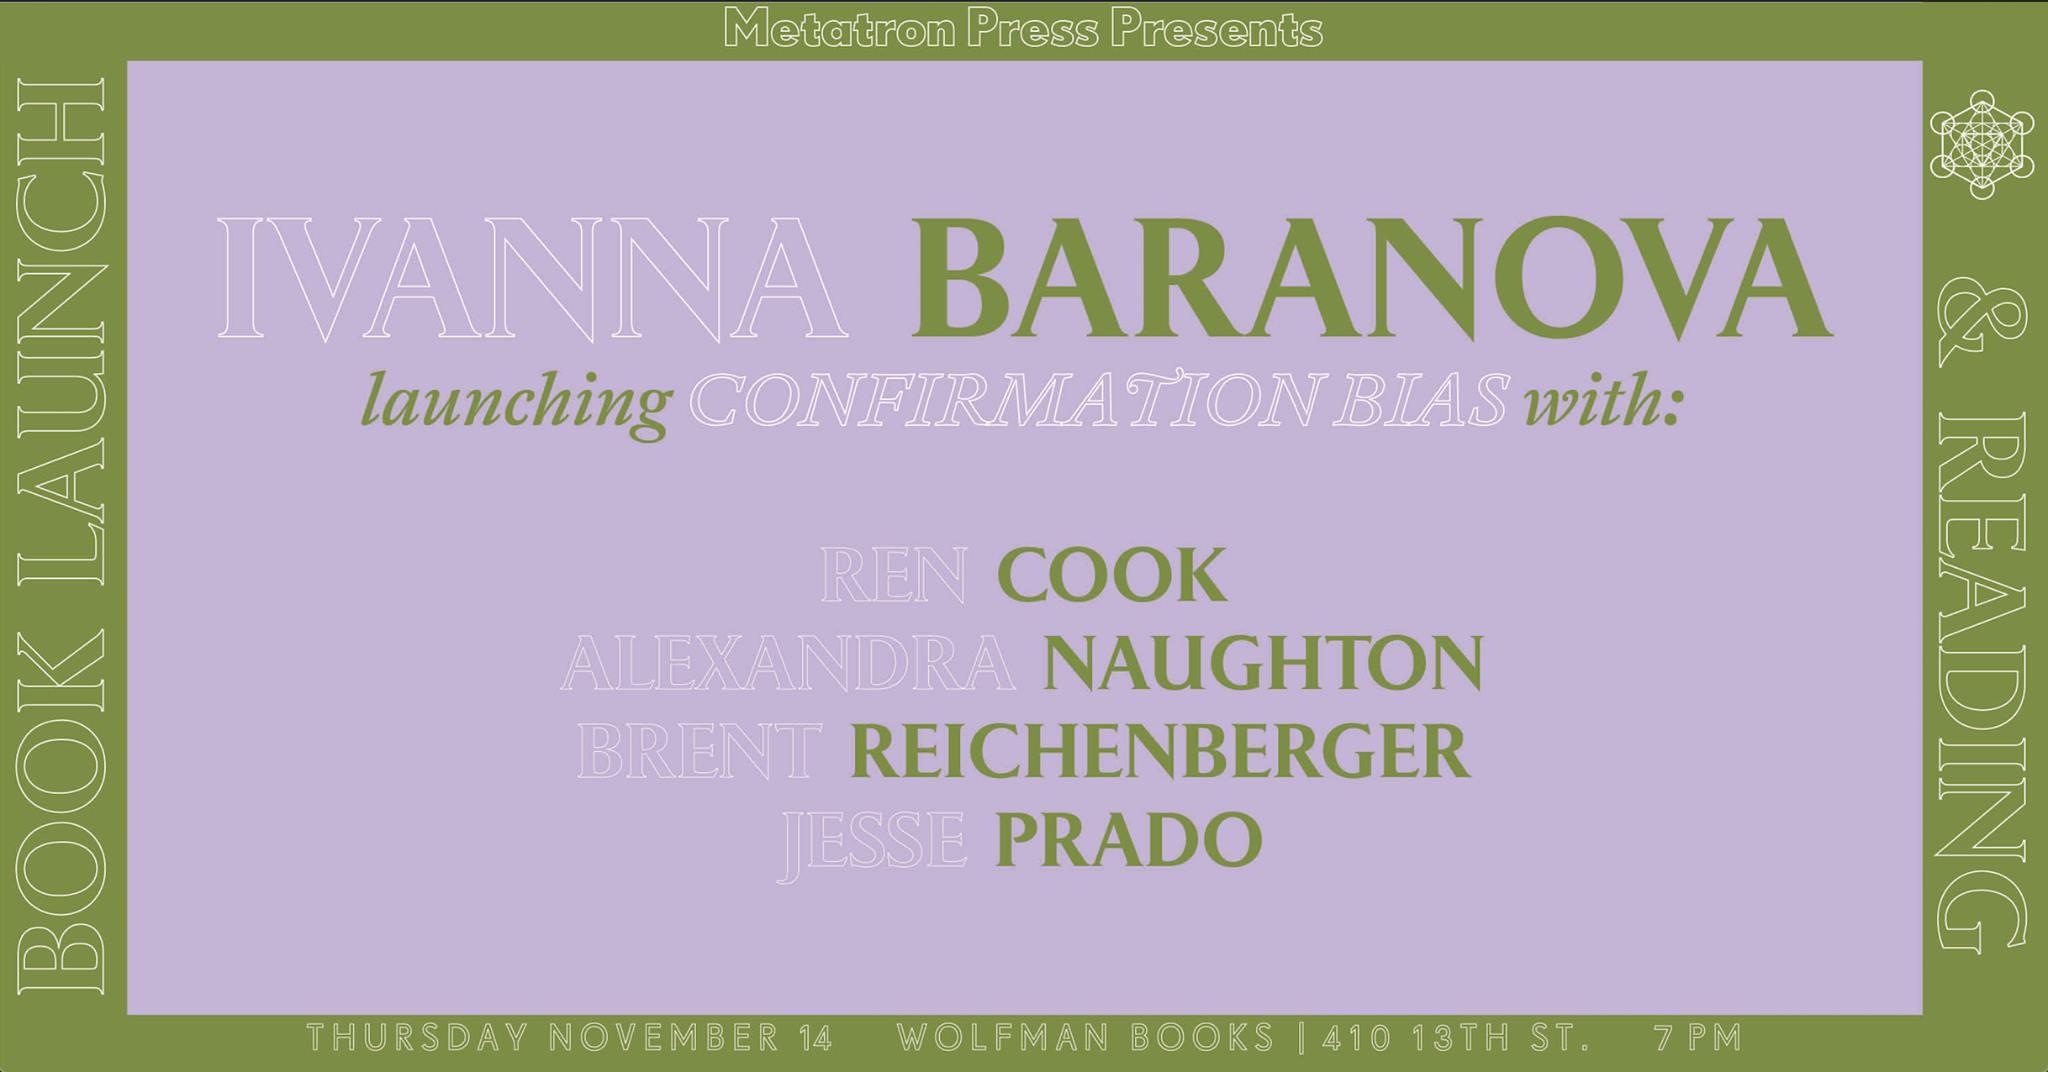 flier for Ivanna Baranova